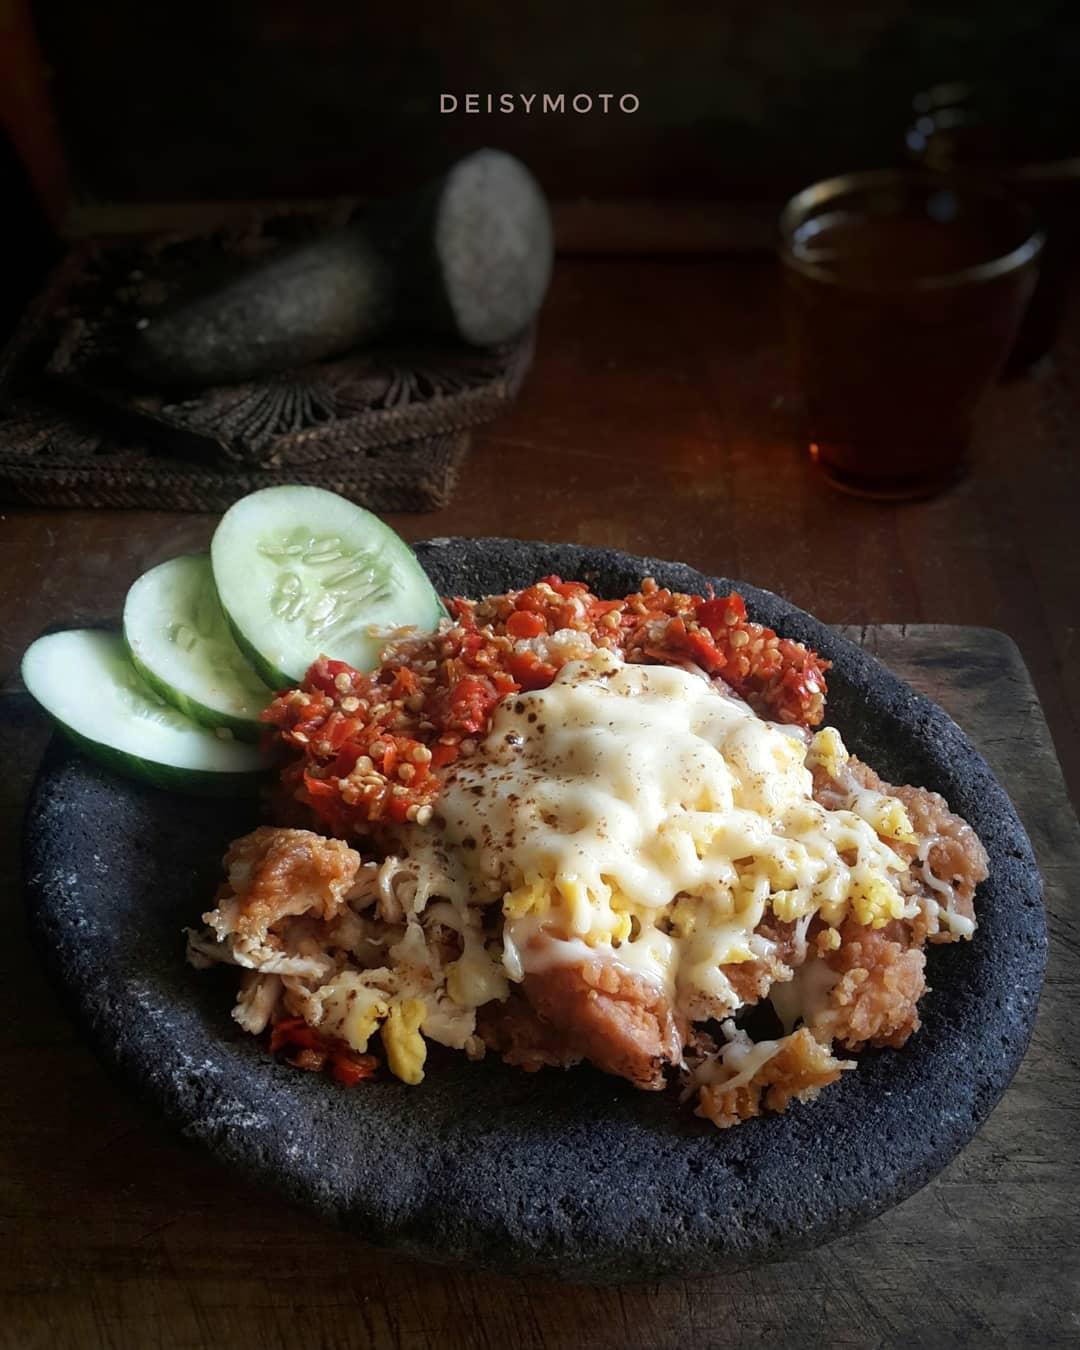 Ayam Geprek Bensu Malang, Malang, Kota Malang, Dolan Dolen, Dolaners Ayam Geprek Bensu Malang via deisy arkamasmom - Dolan Dolen